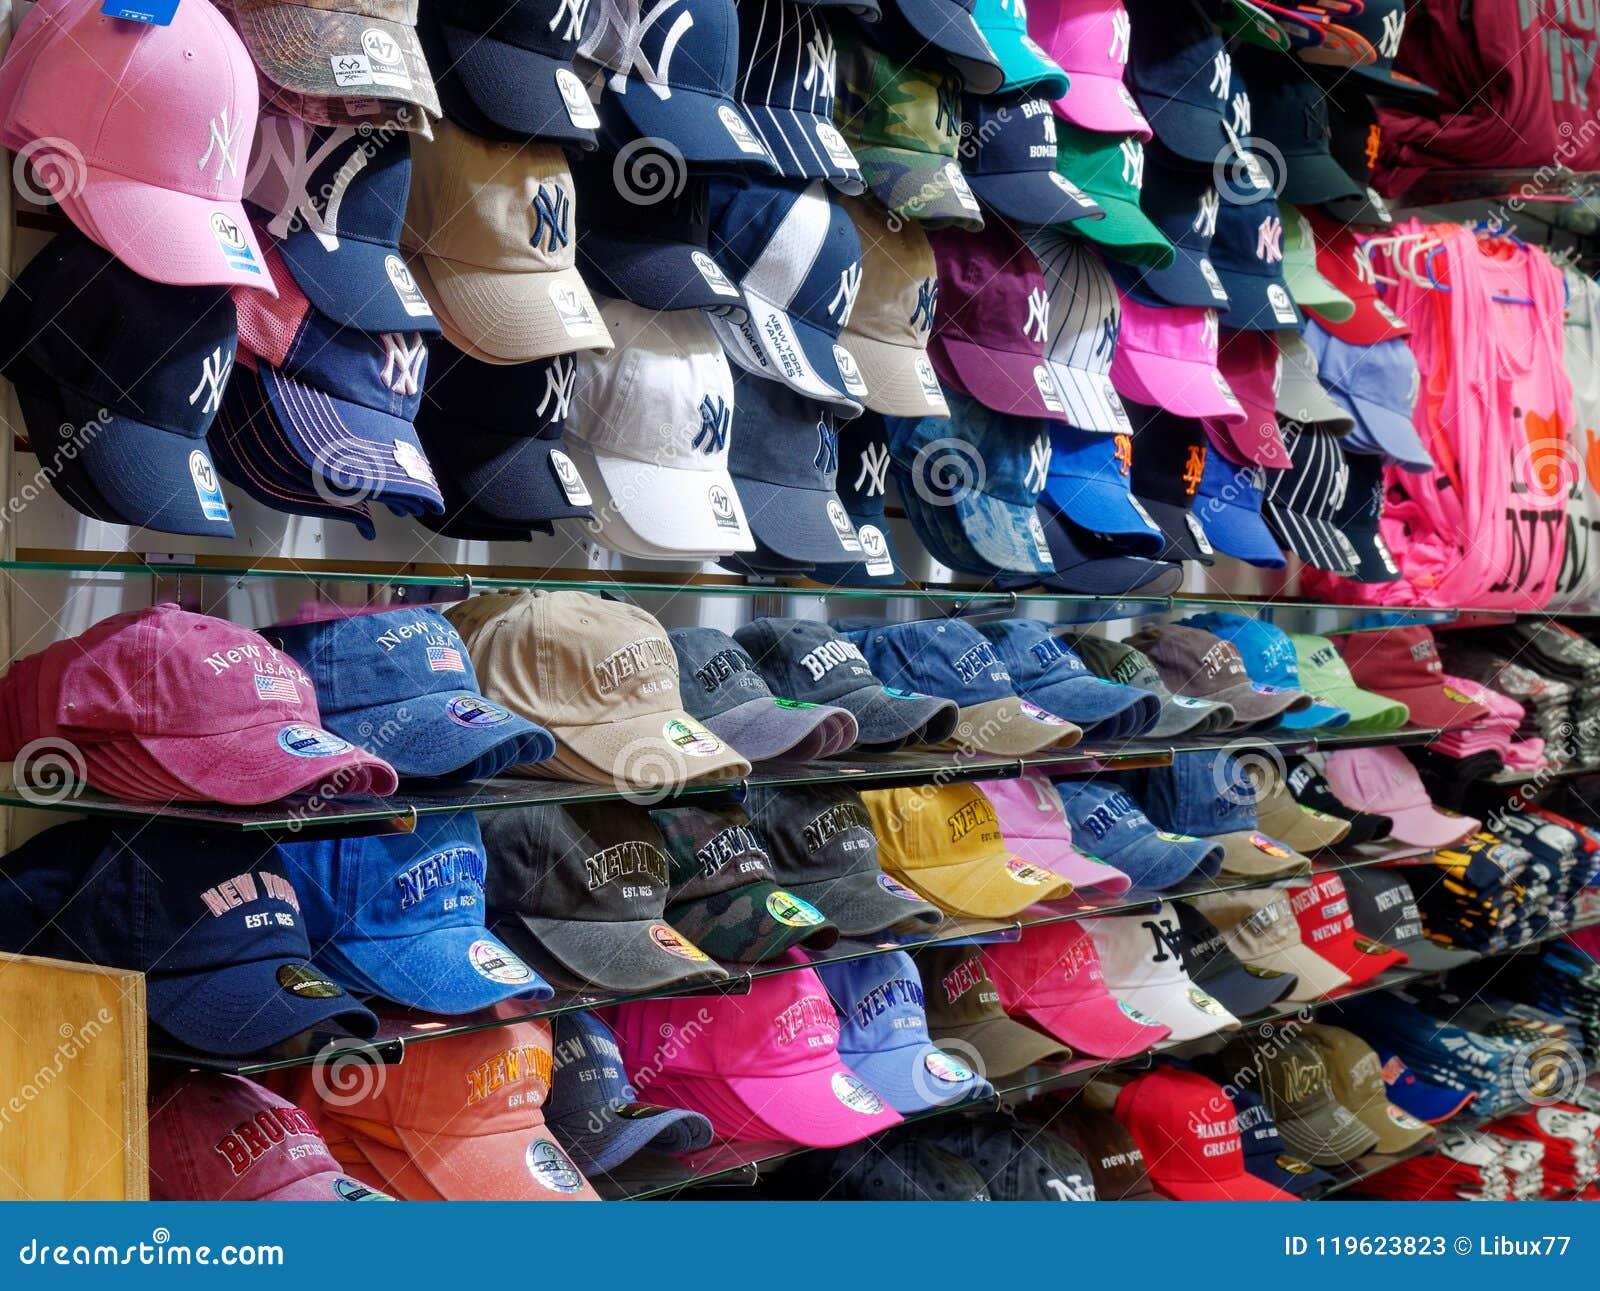 9e1f51fb4 New York Merchandising Caps Souvenirs Shop Editorial Stock Photo ...